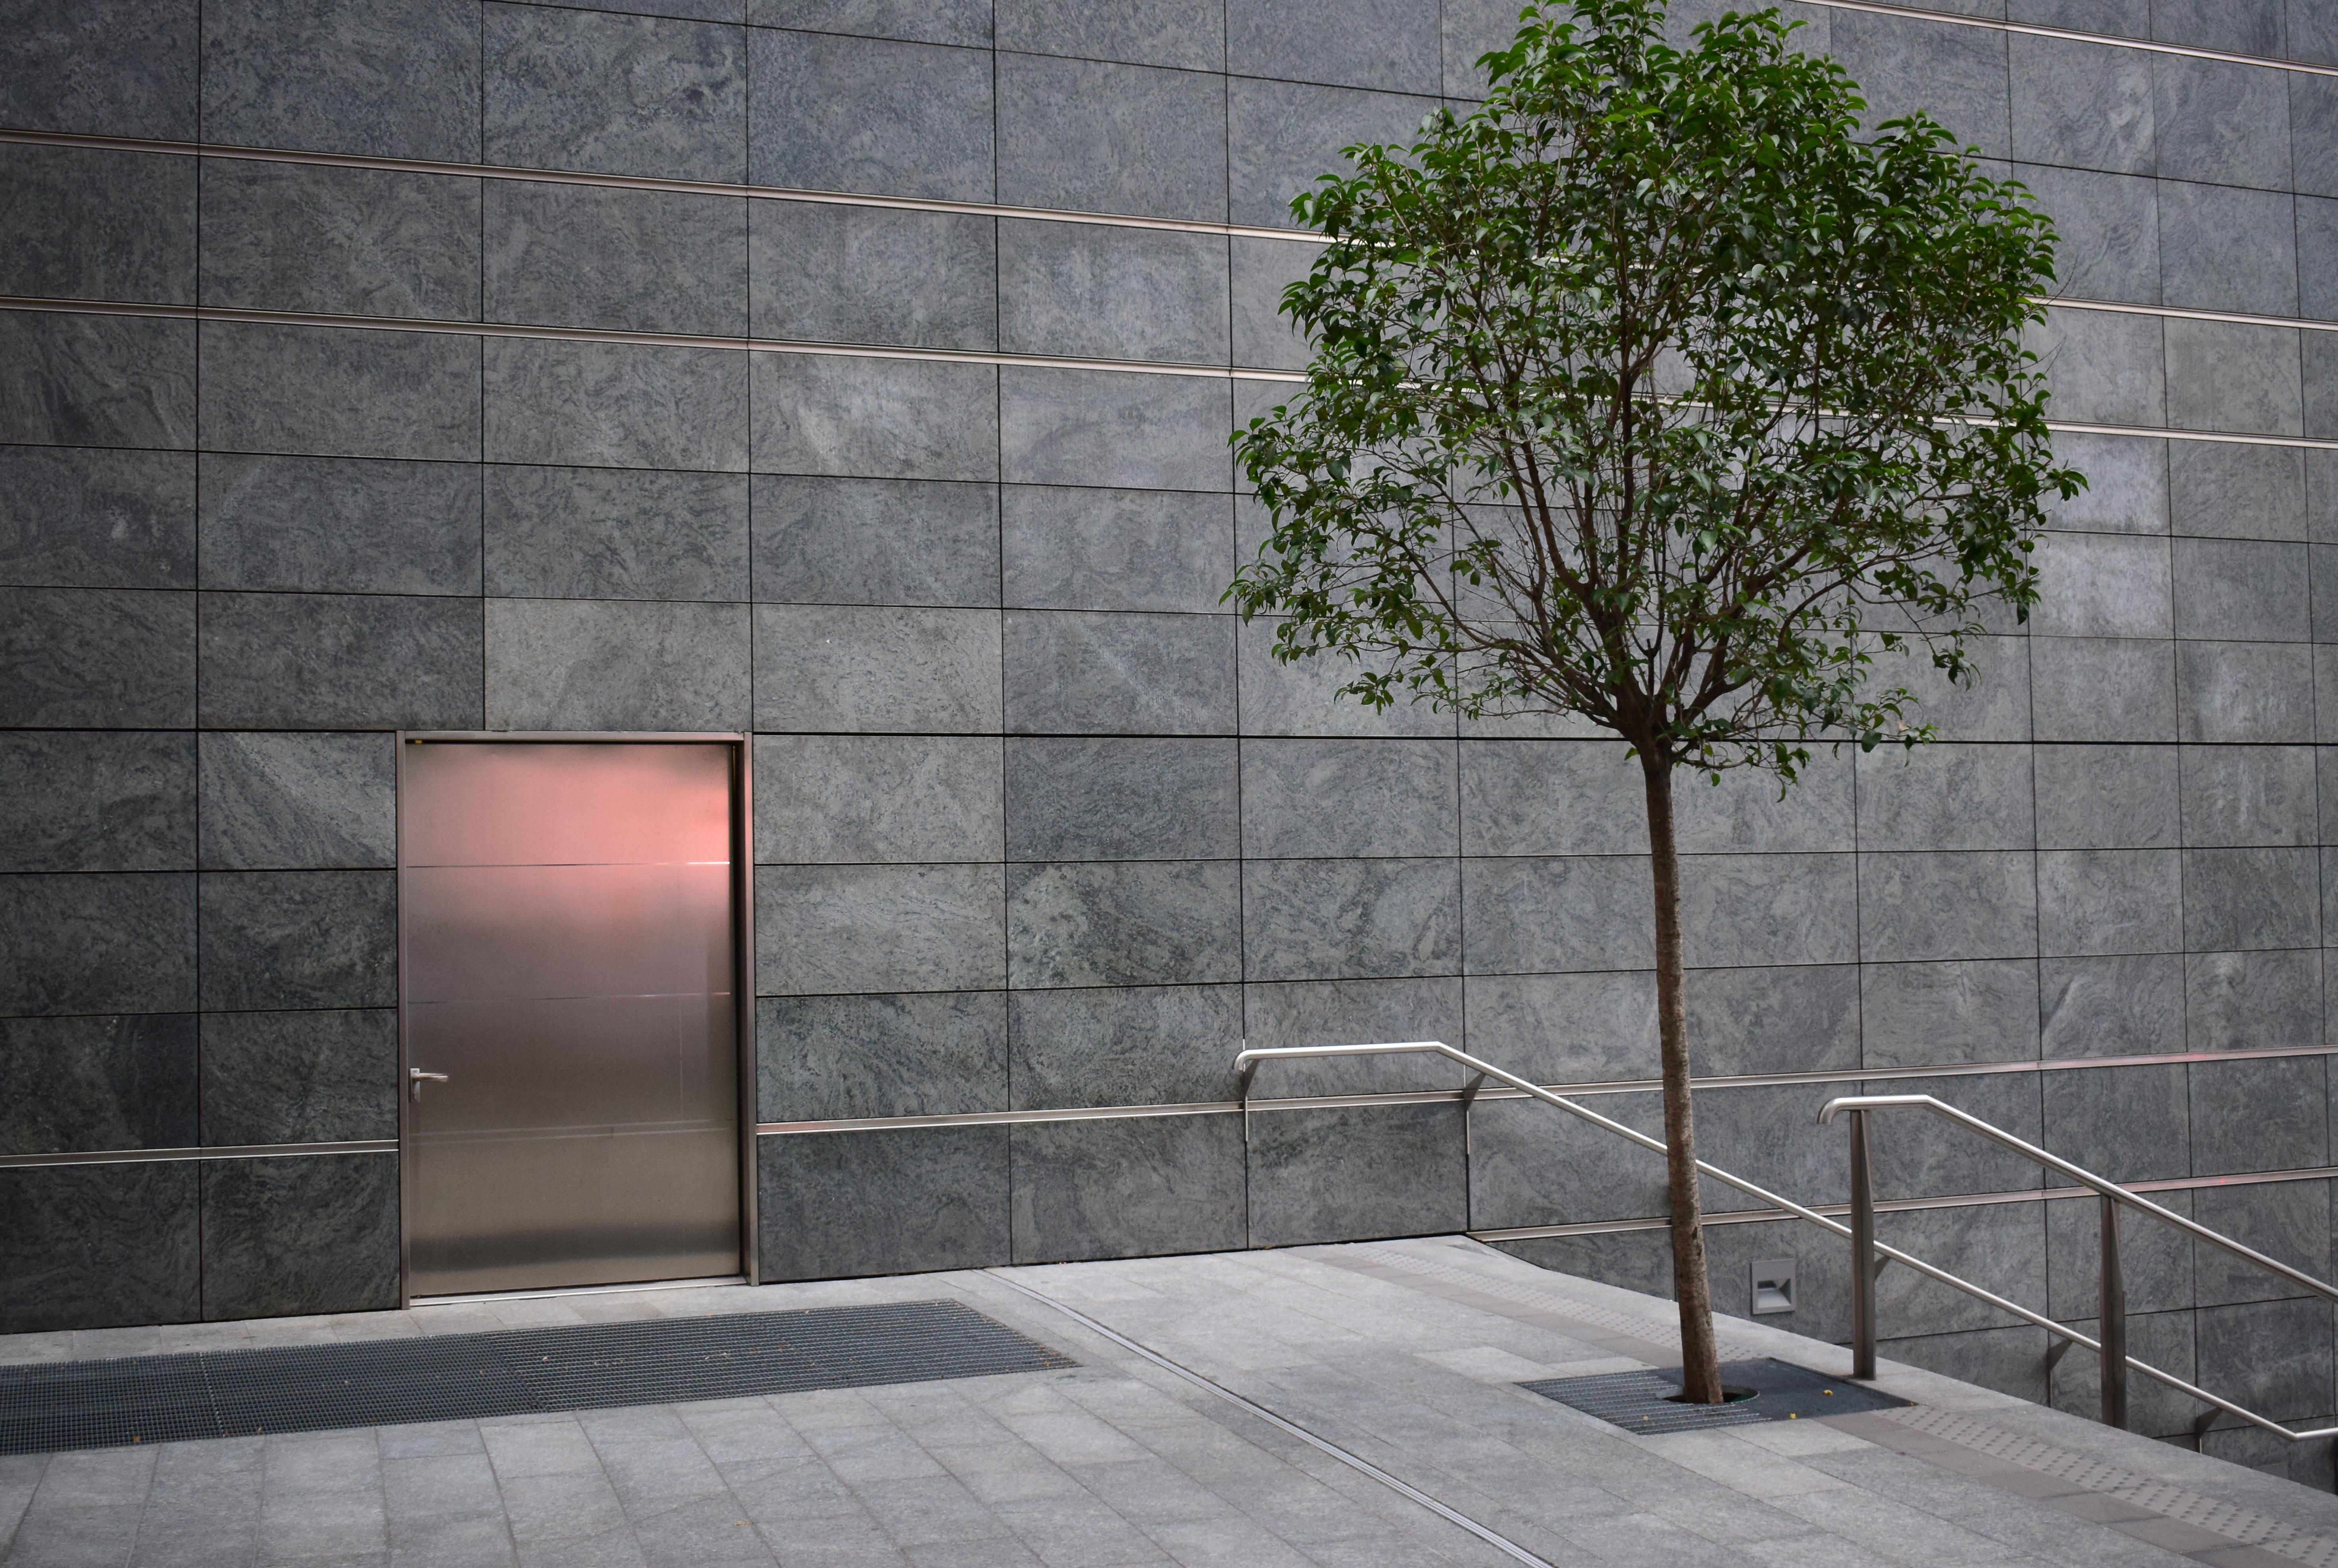 Architecture House Urban Wall Facade Tile Door Interior Design Courtyard  Minimalism Flooring